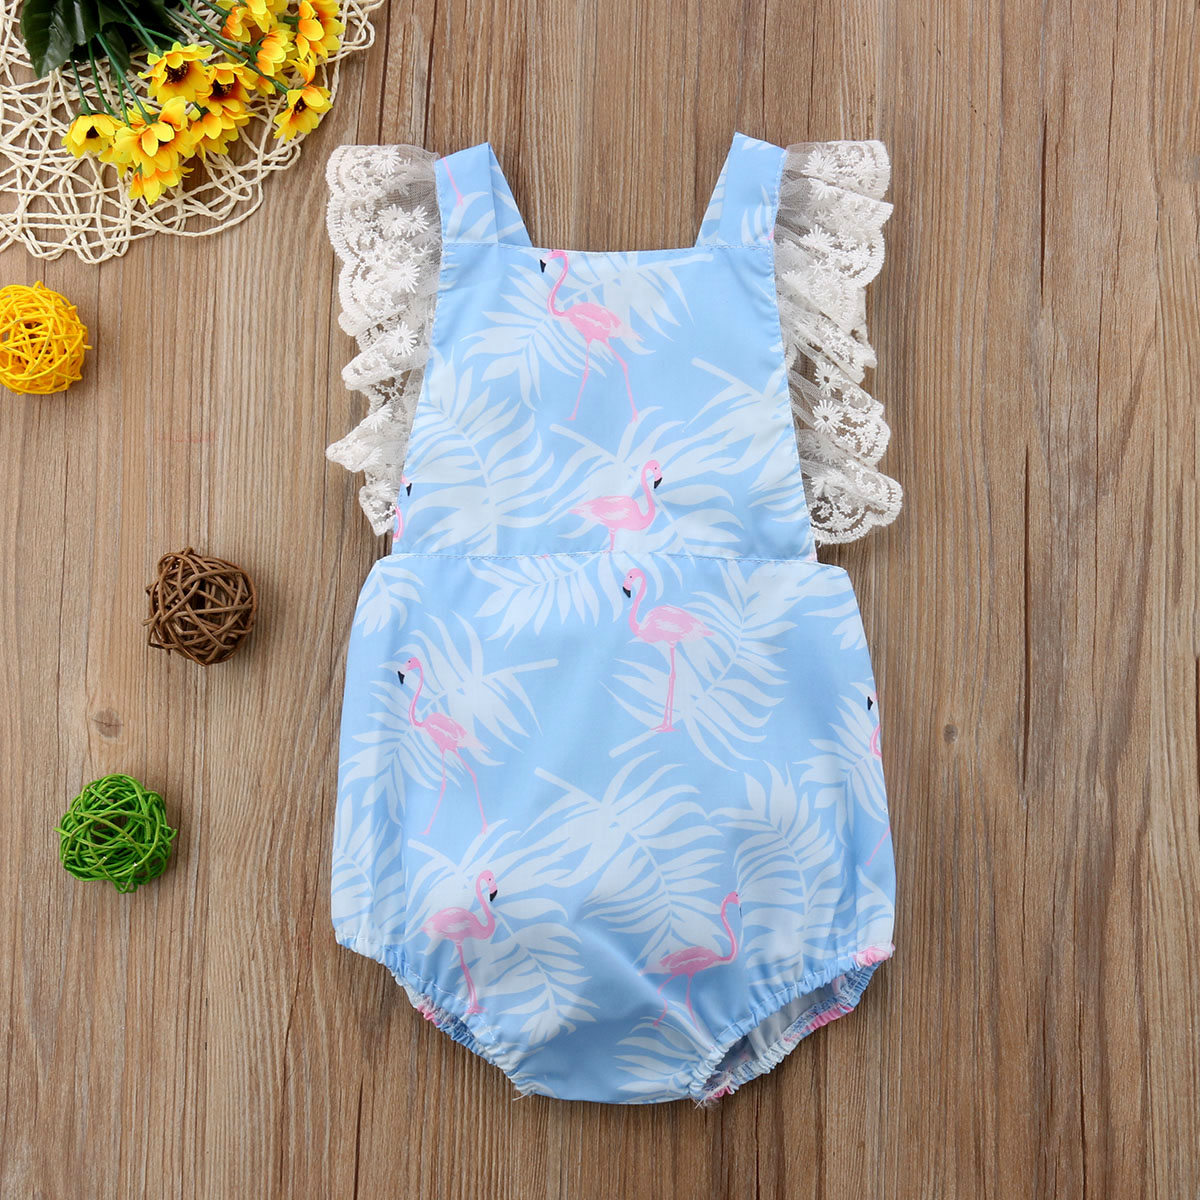 Cute Newborn Infant Baby Girl Cartoon Lace Bodysuit Jumpsuit Sunsuit Cotton Bbay Girls Clothes Summer Children Clothing 0-3T